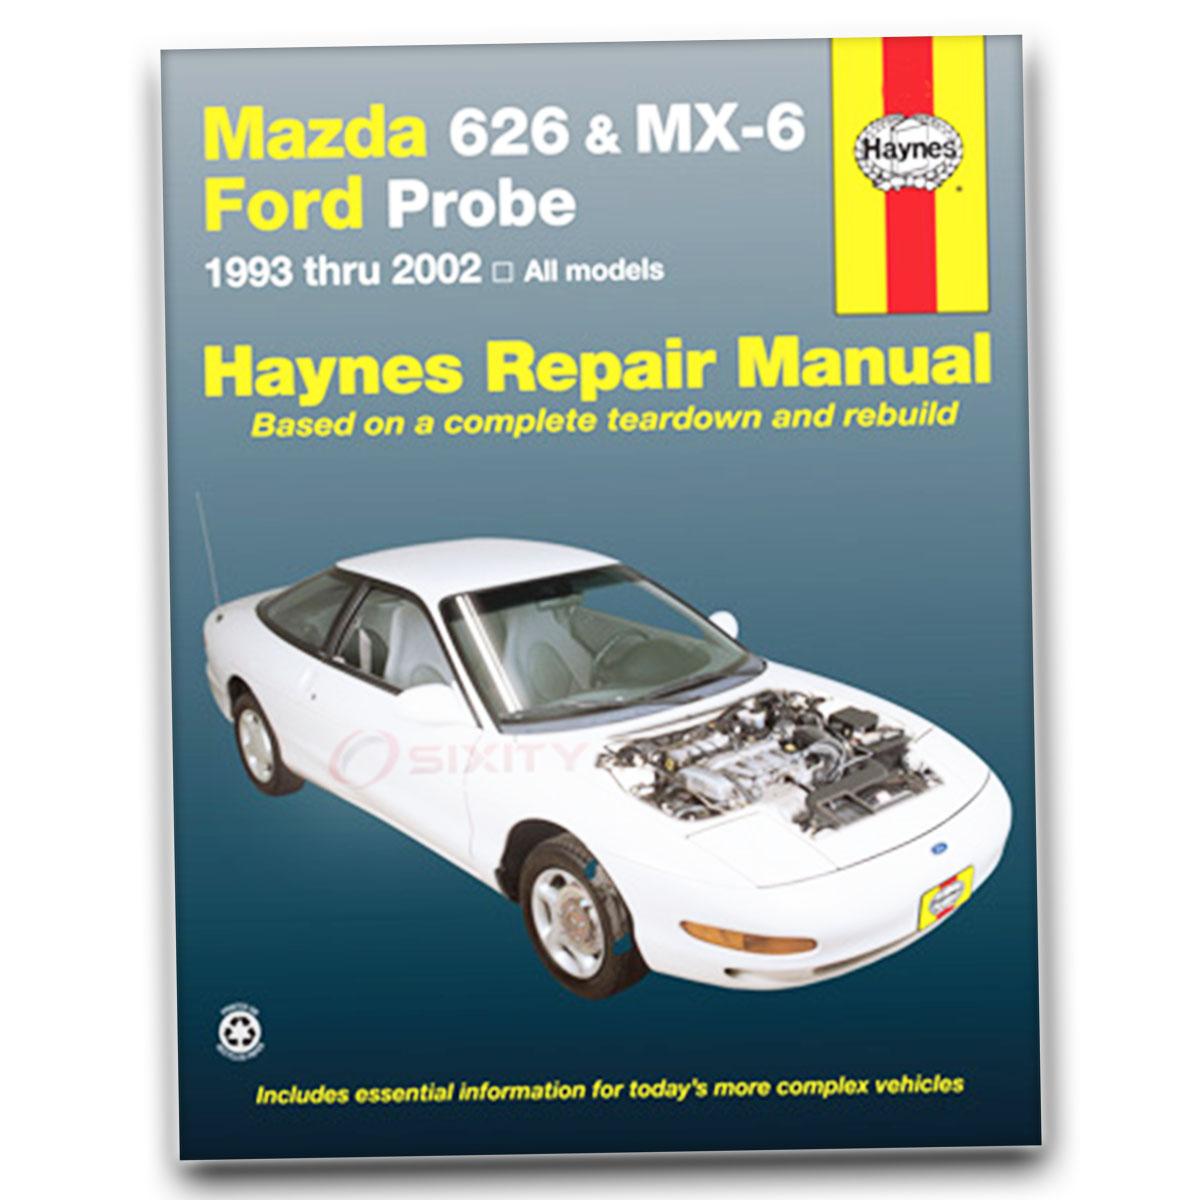 Haynes Repair Manual 61042 for Mazda 626 MX-6 Ford Probe 93-02 Shop Service  ar